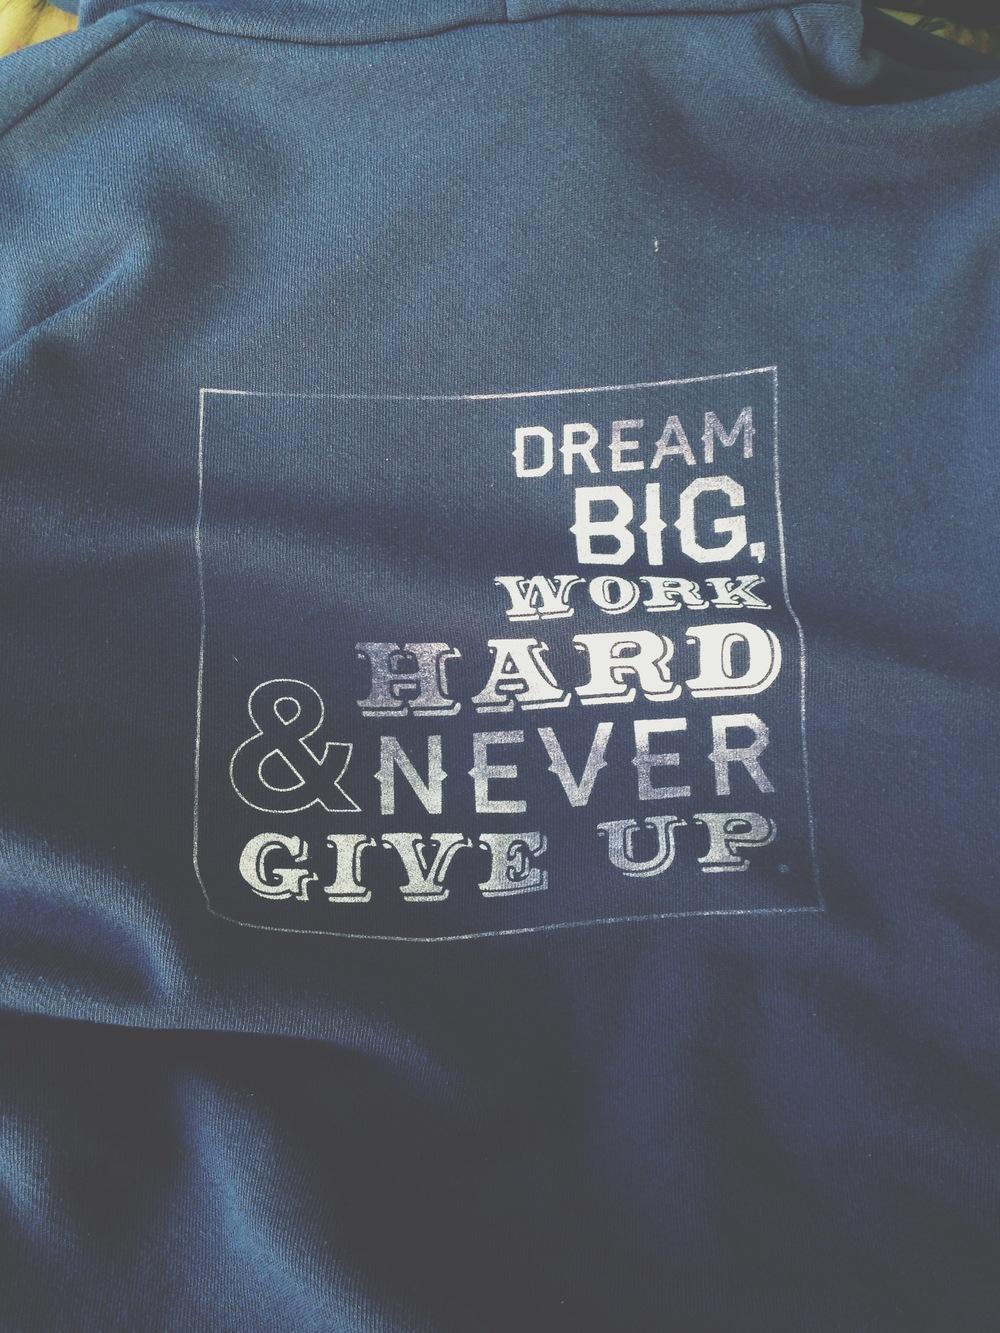 Dream big, work hard & follow your dreams